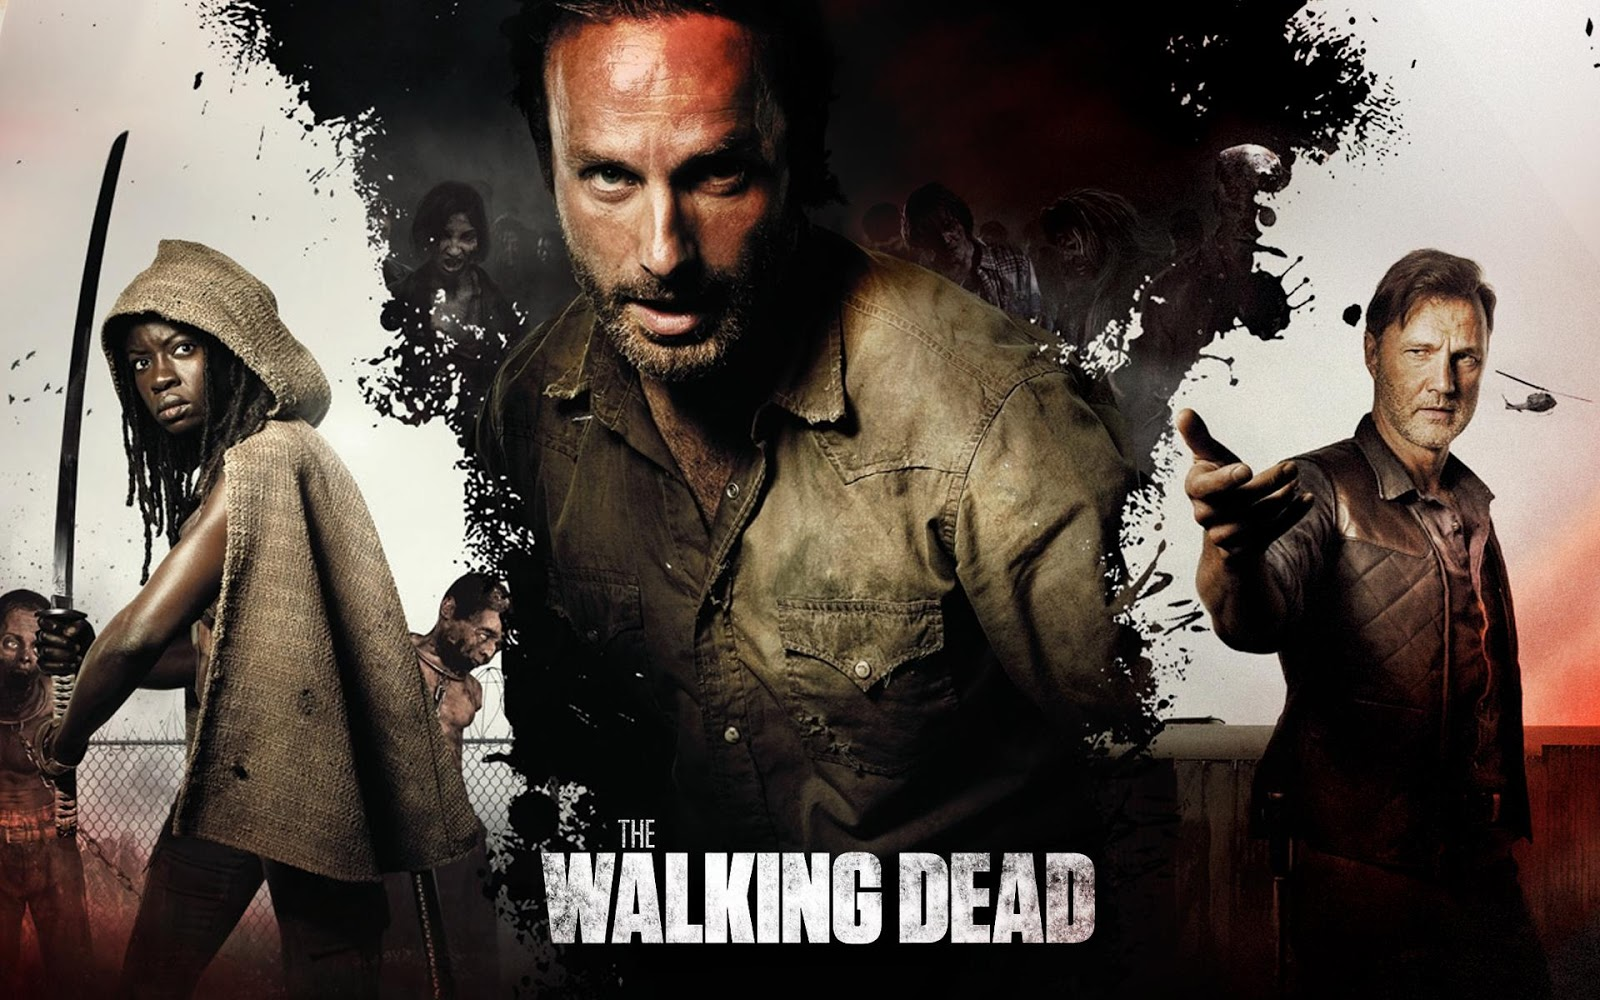 The Walking Dead S08E14: Quem Negan encontrou na estrada? - The ...